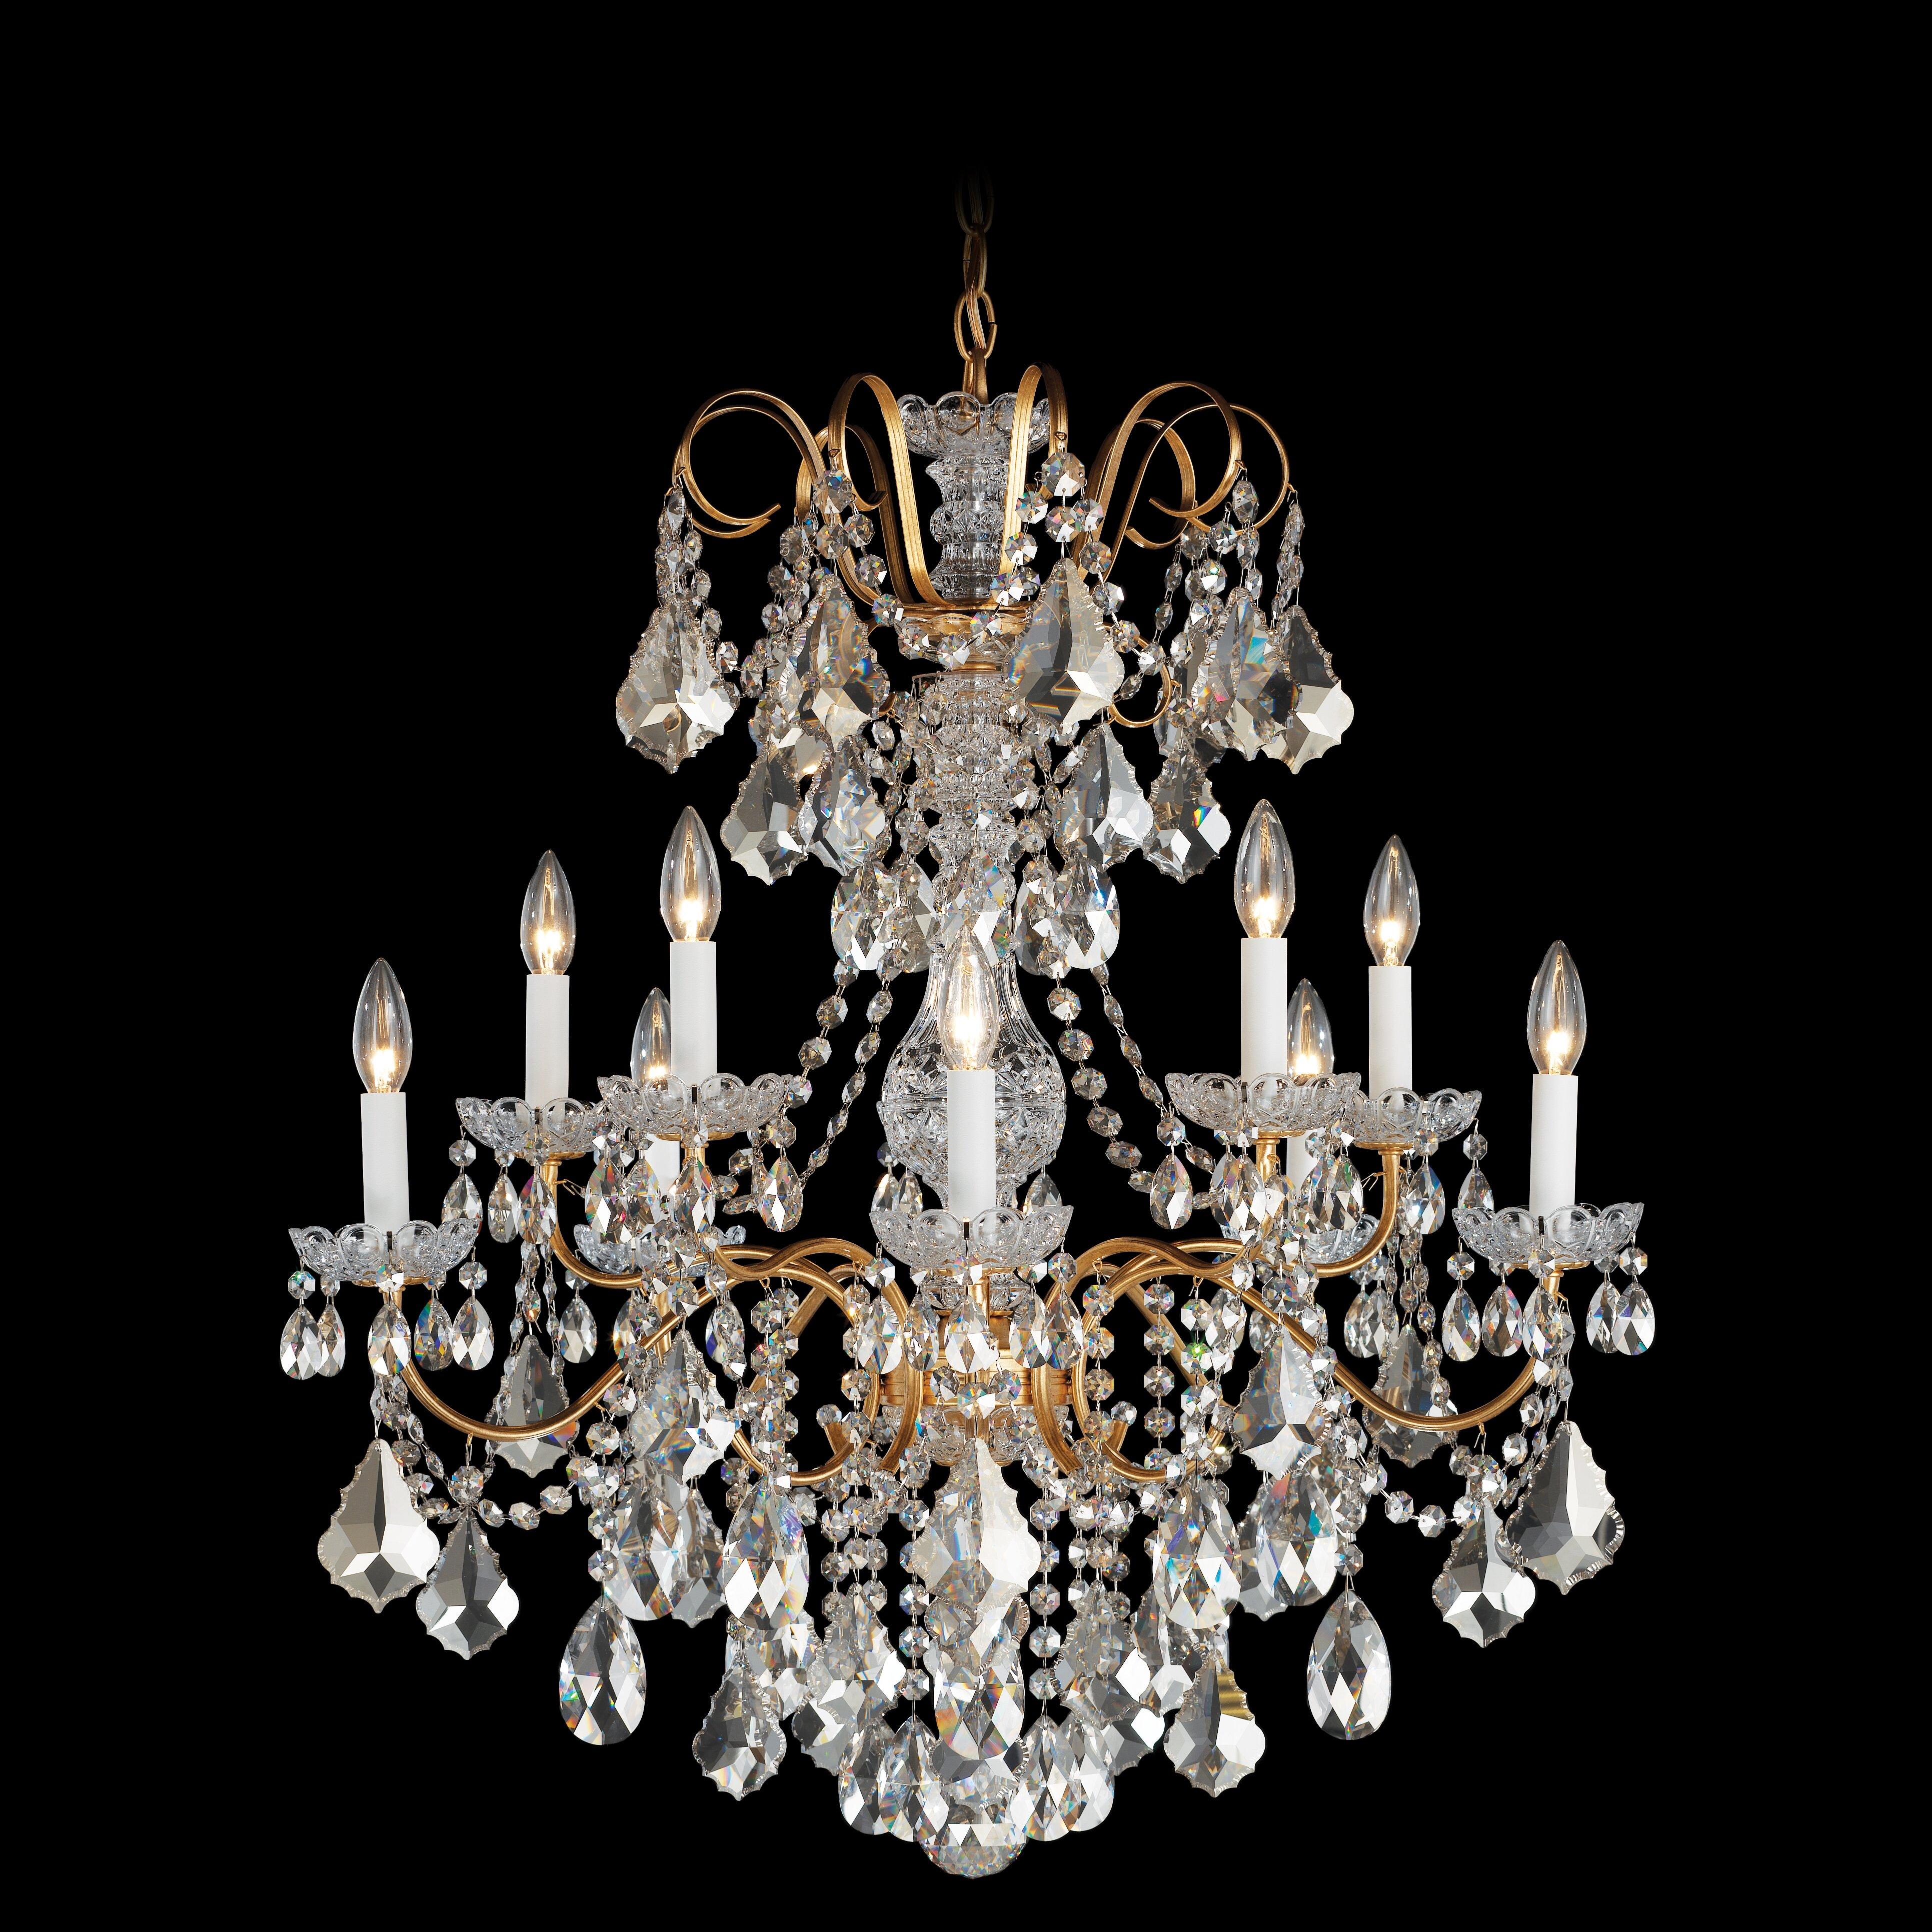 Schonbek Chandelier Wayfair: Schonbek New Orleans 10 Light Chandelier & Reviews